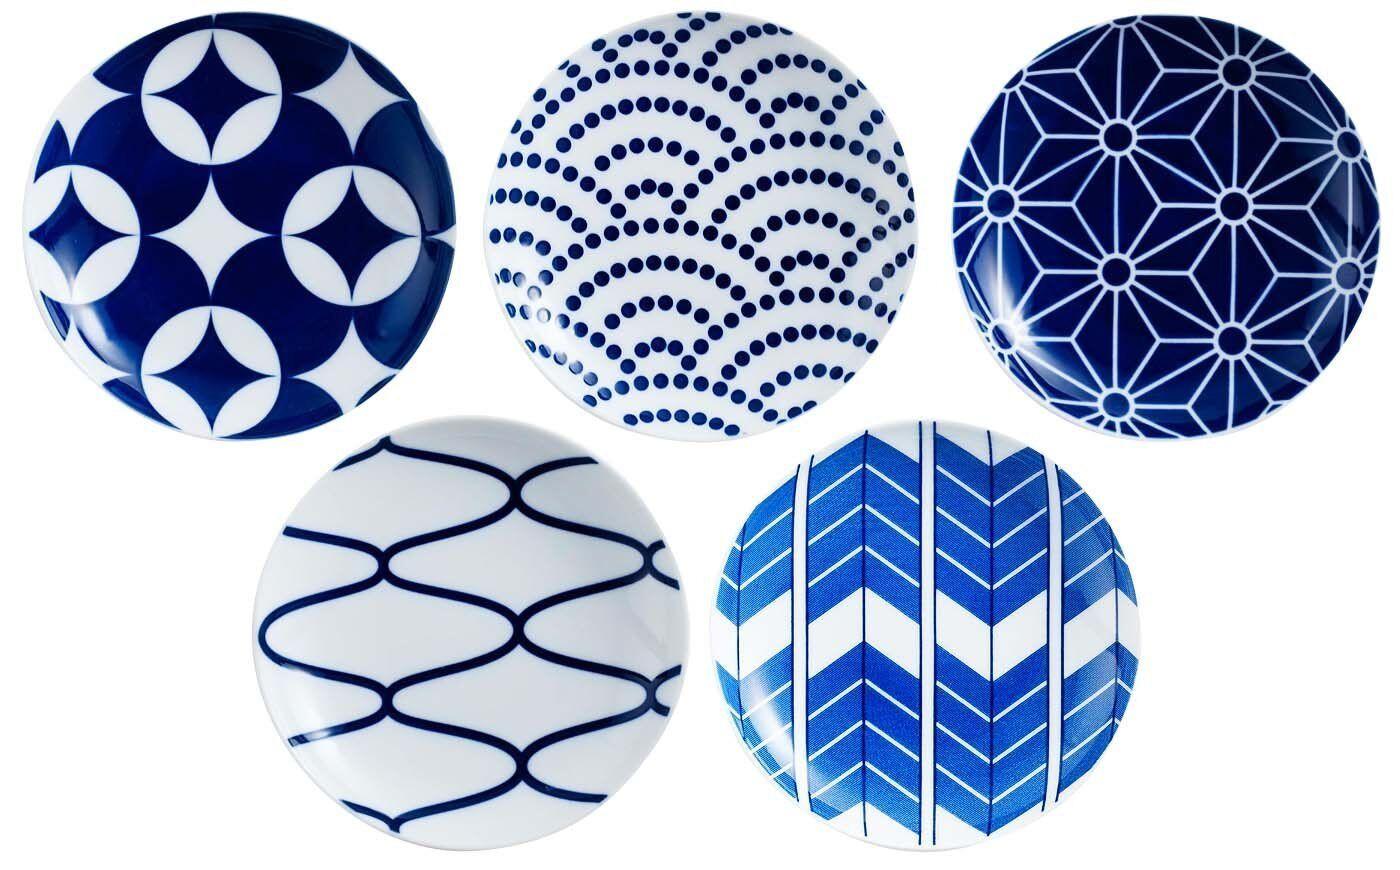 KIHARA KOMON Japanese Traditional Pattern Plate Small Dish Set F S Made in Japan